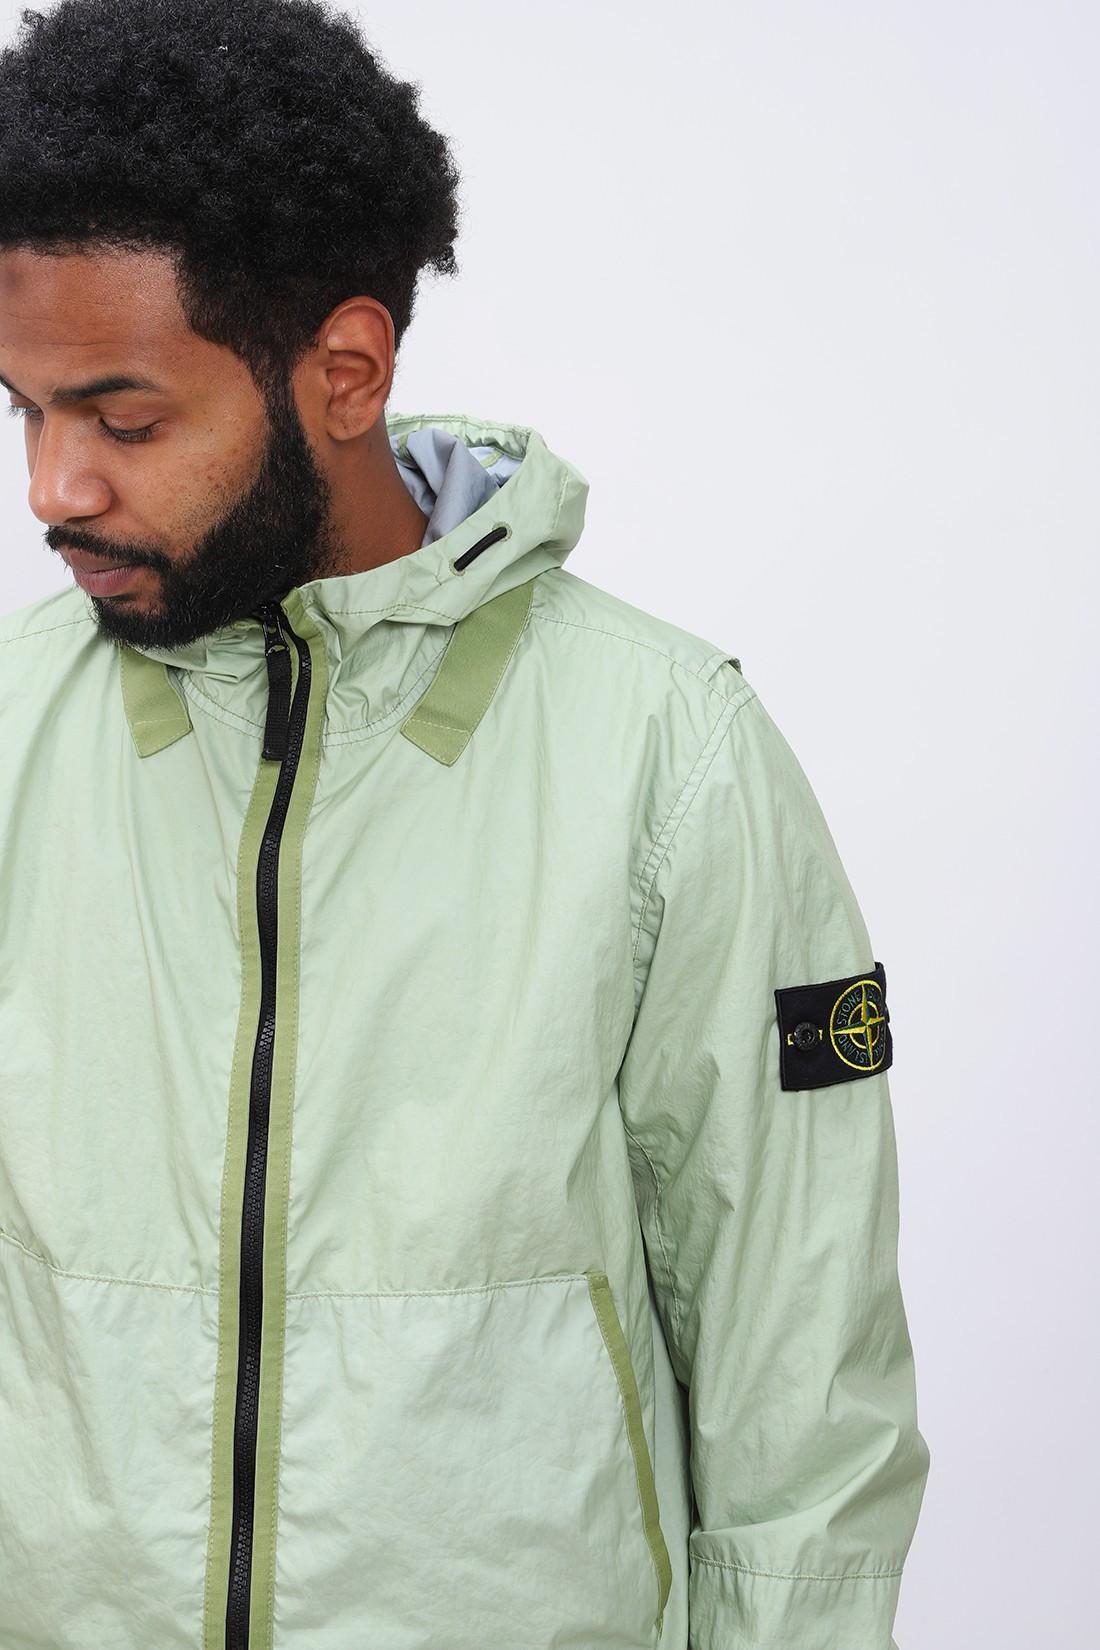 STONE ISLAND / 40523 membrana jacket v0052 Verde chiaro